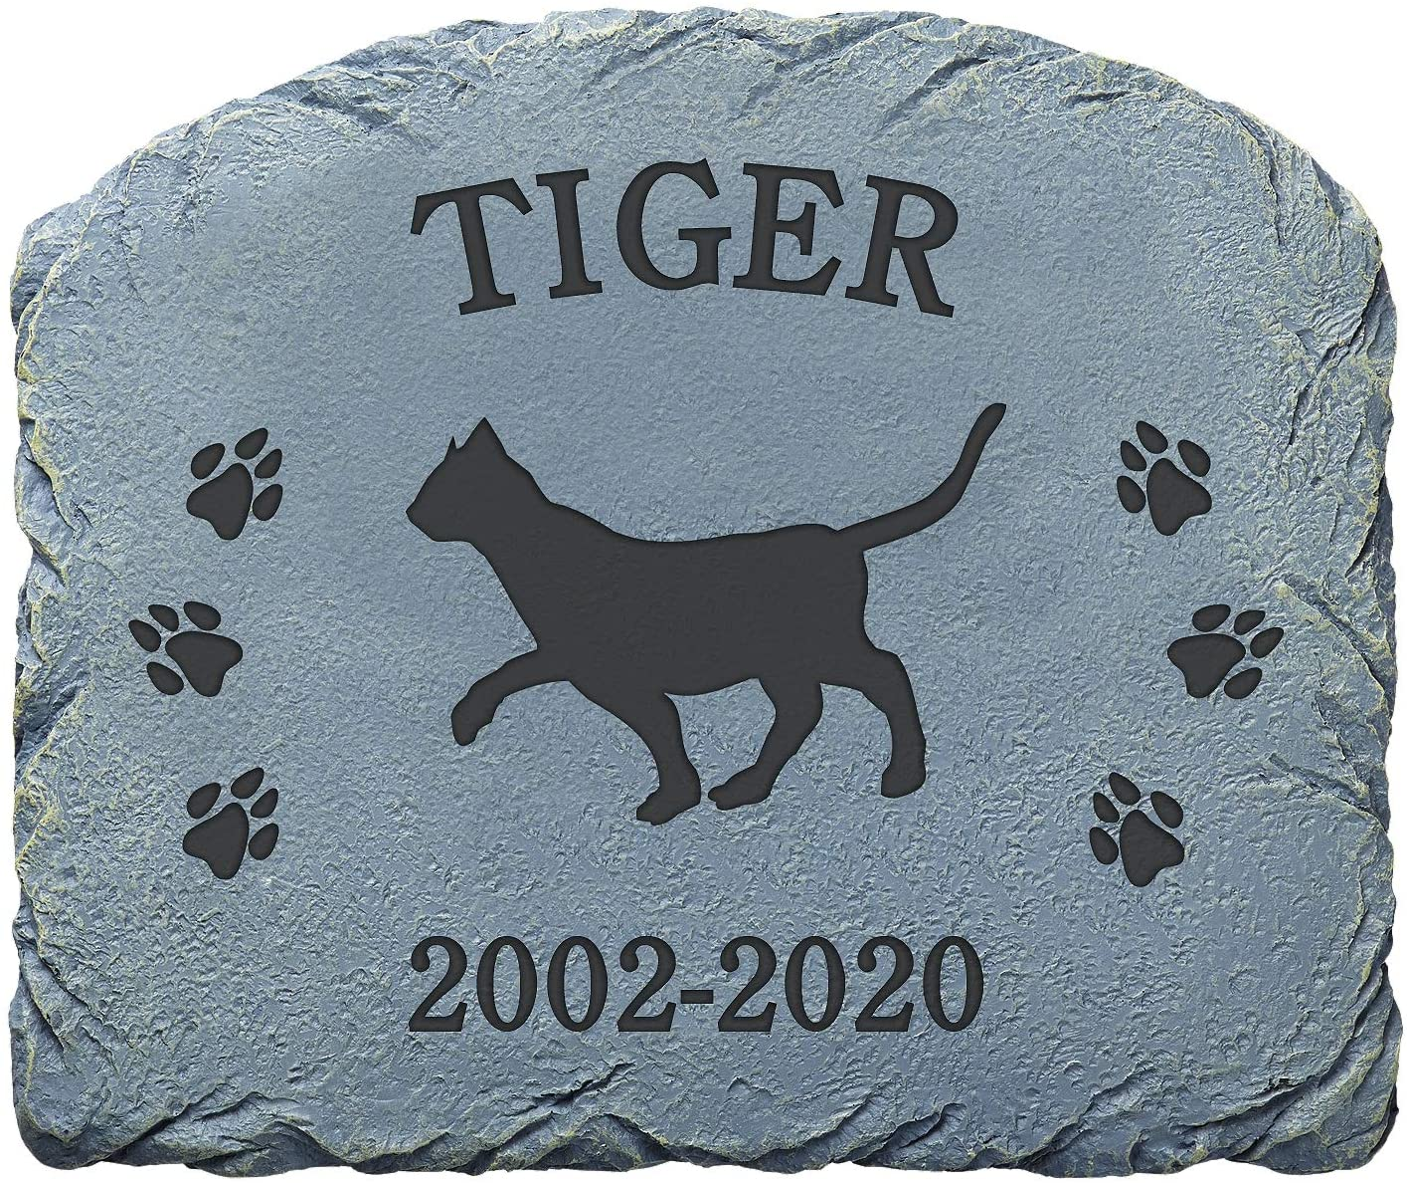 "Let's Make Memories Personalized Memorial Garden Stone - Pet Memorial - Sympathy Garden Stone -Cat Memorial - Cat Garden Stone - Engraved with Your Pet's Name - 9 1/2""L x 11 1/2""W x 1/2""D"